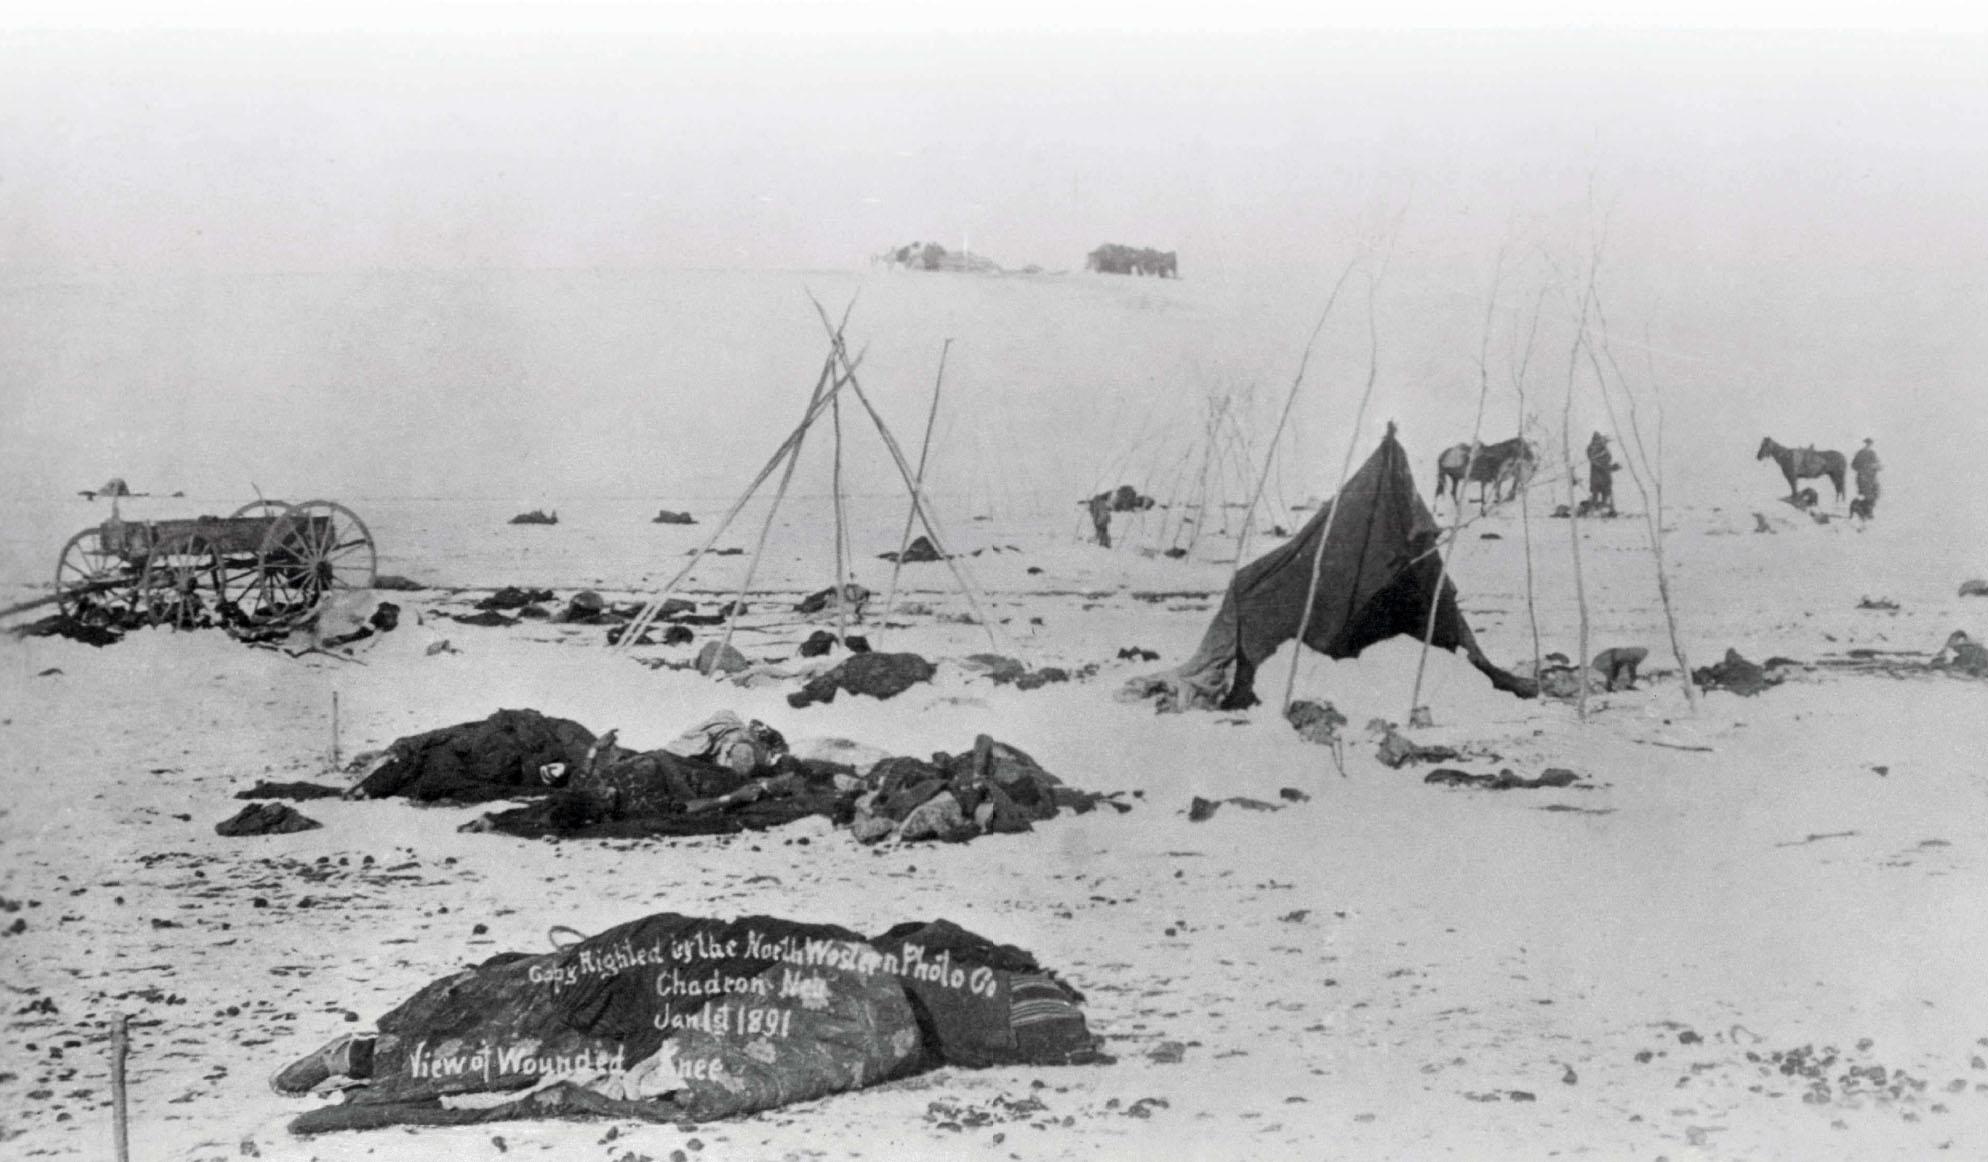 Wounded Knee Massacre | Pocketmags.com